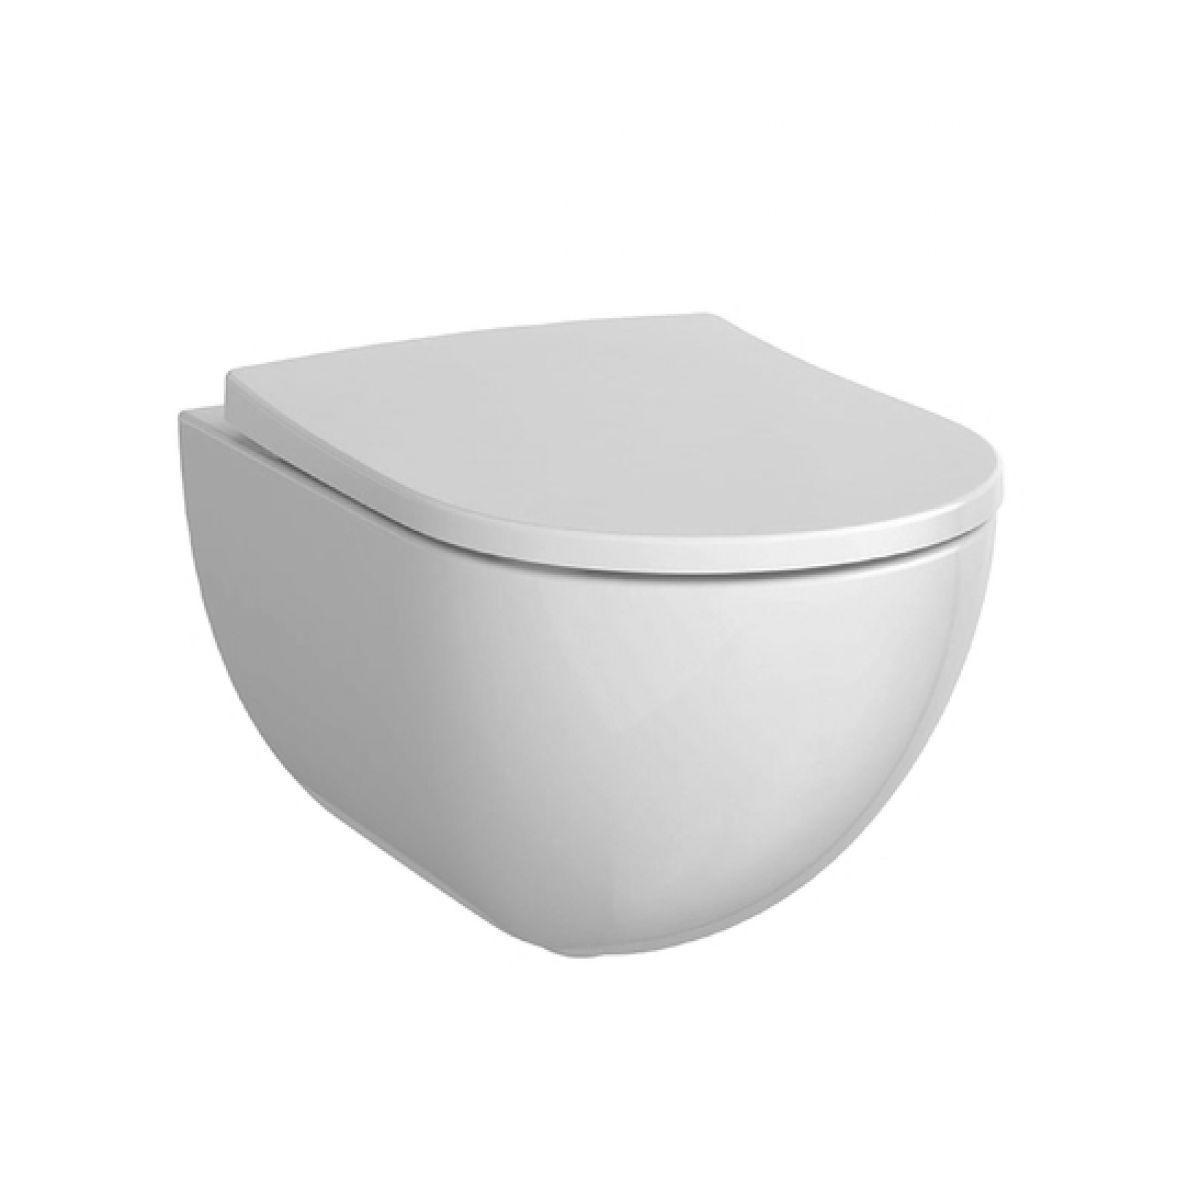 Geberit Acanto Wall Hung Toilet Rimfree Bathrooms Direct